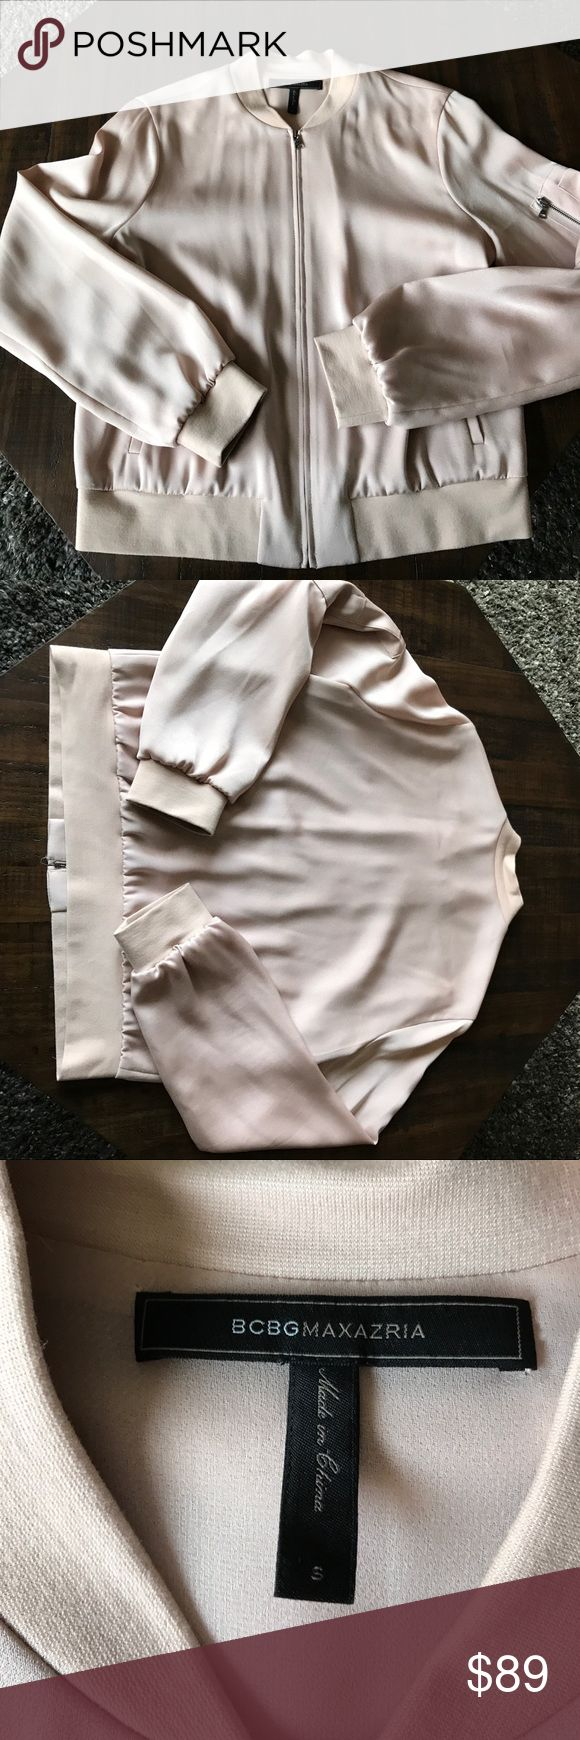 BCBGMAXAZRIA blush bomber jacket size S BCBGMAXAZRIA silly blush colored bomber jacket size S, perfect condition BCBGMaxAzria Jackets & Coats